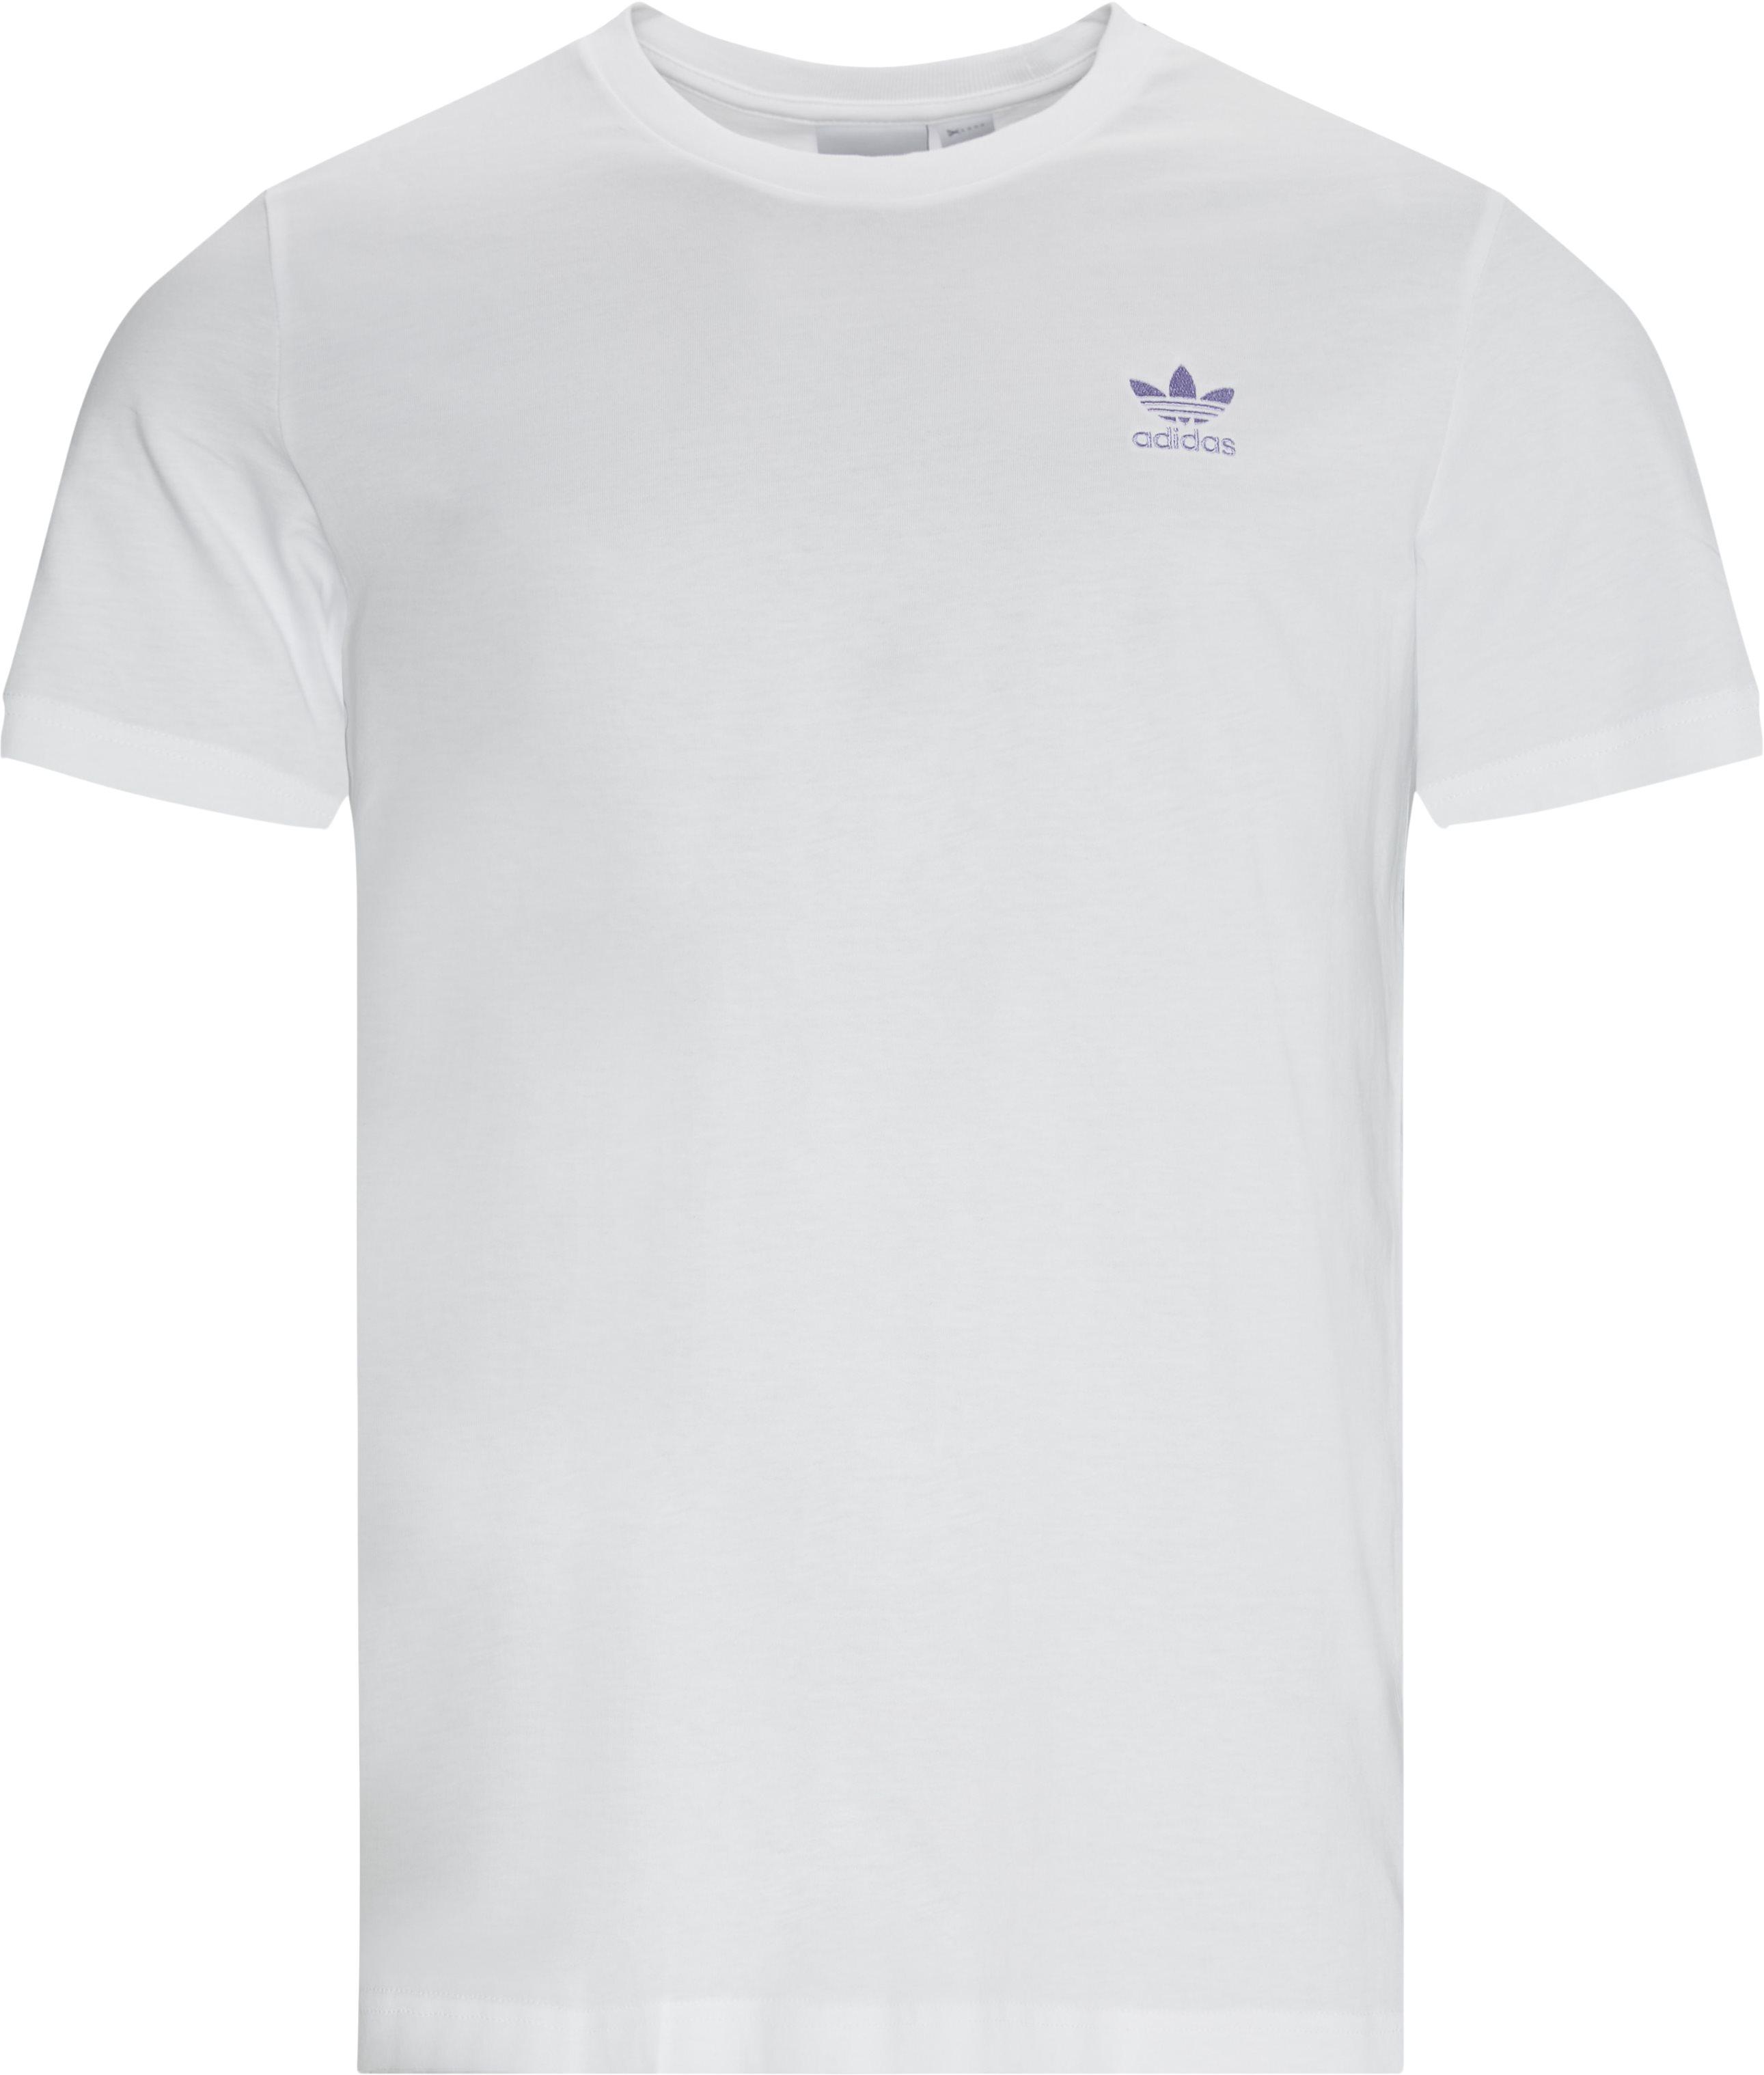 Essential Tee - T-shirts - Regular - Vit